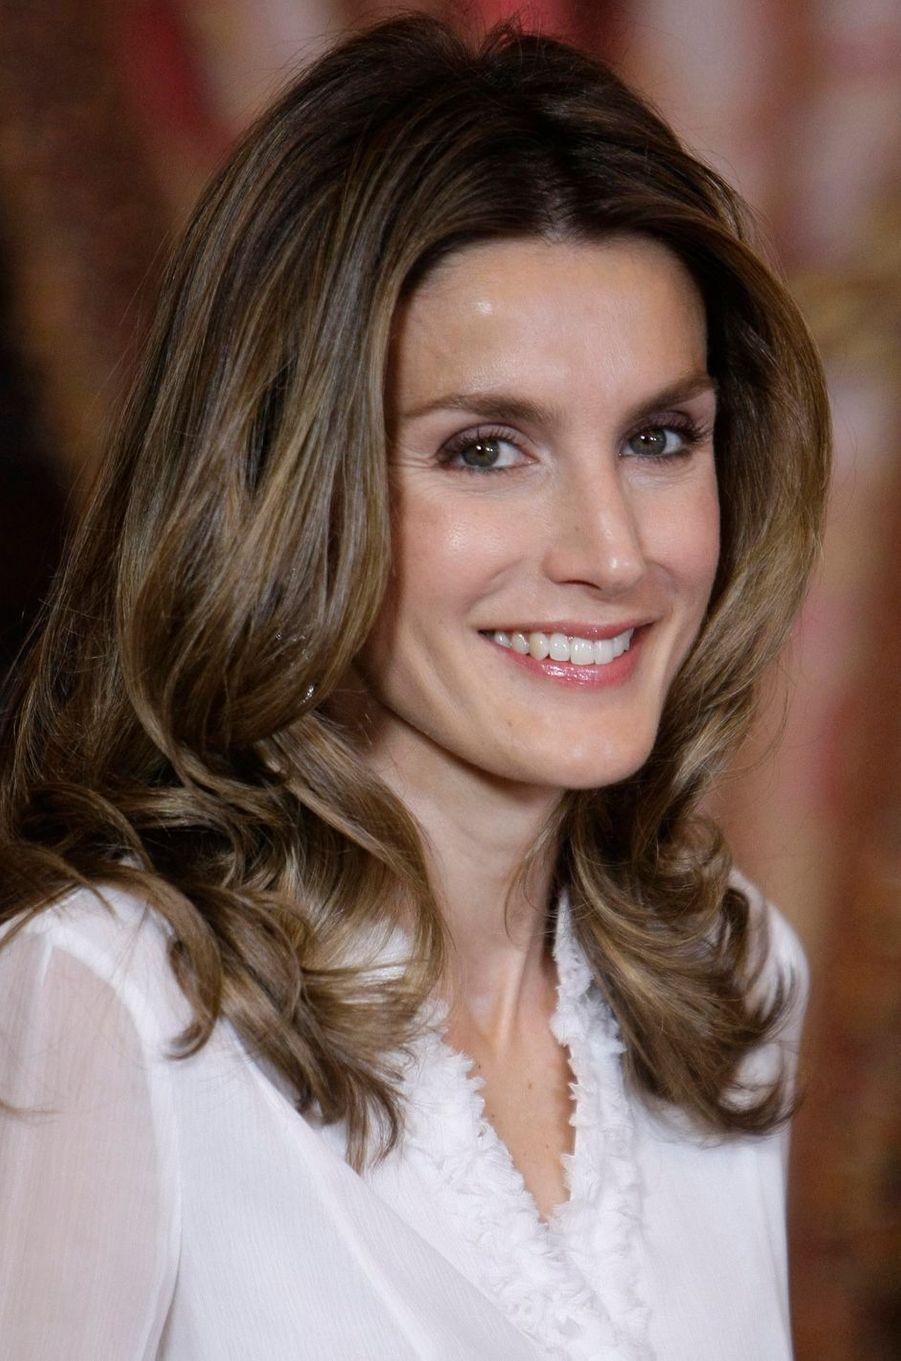 La princesse Letizia d'Espagne, le 16 novembre 2009